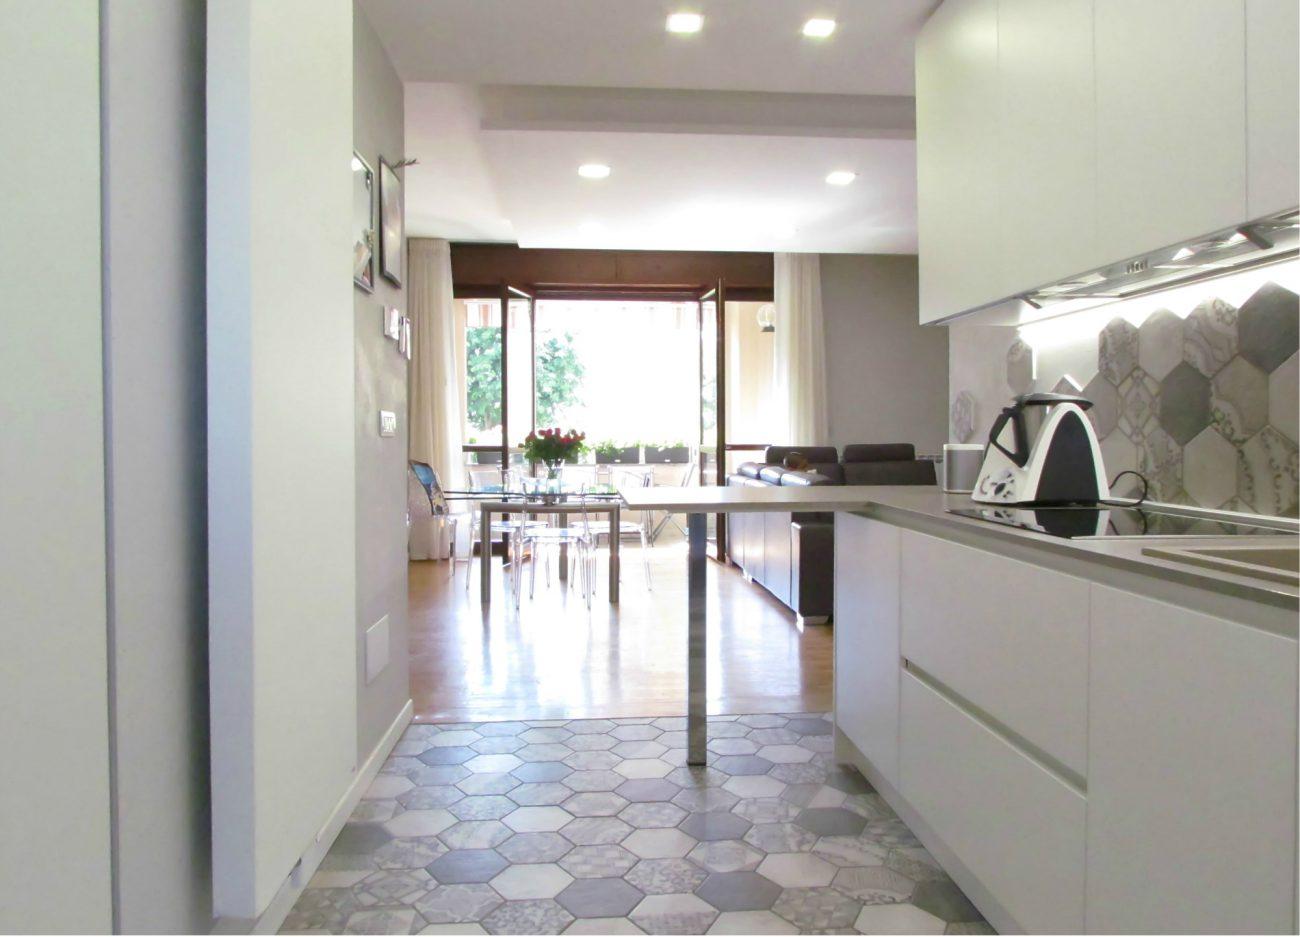 Piastrelle esagonali cucina u casamia idea di immagine